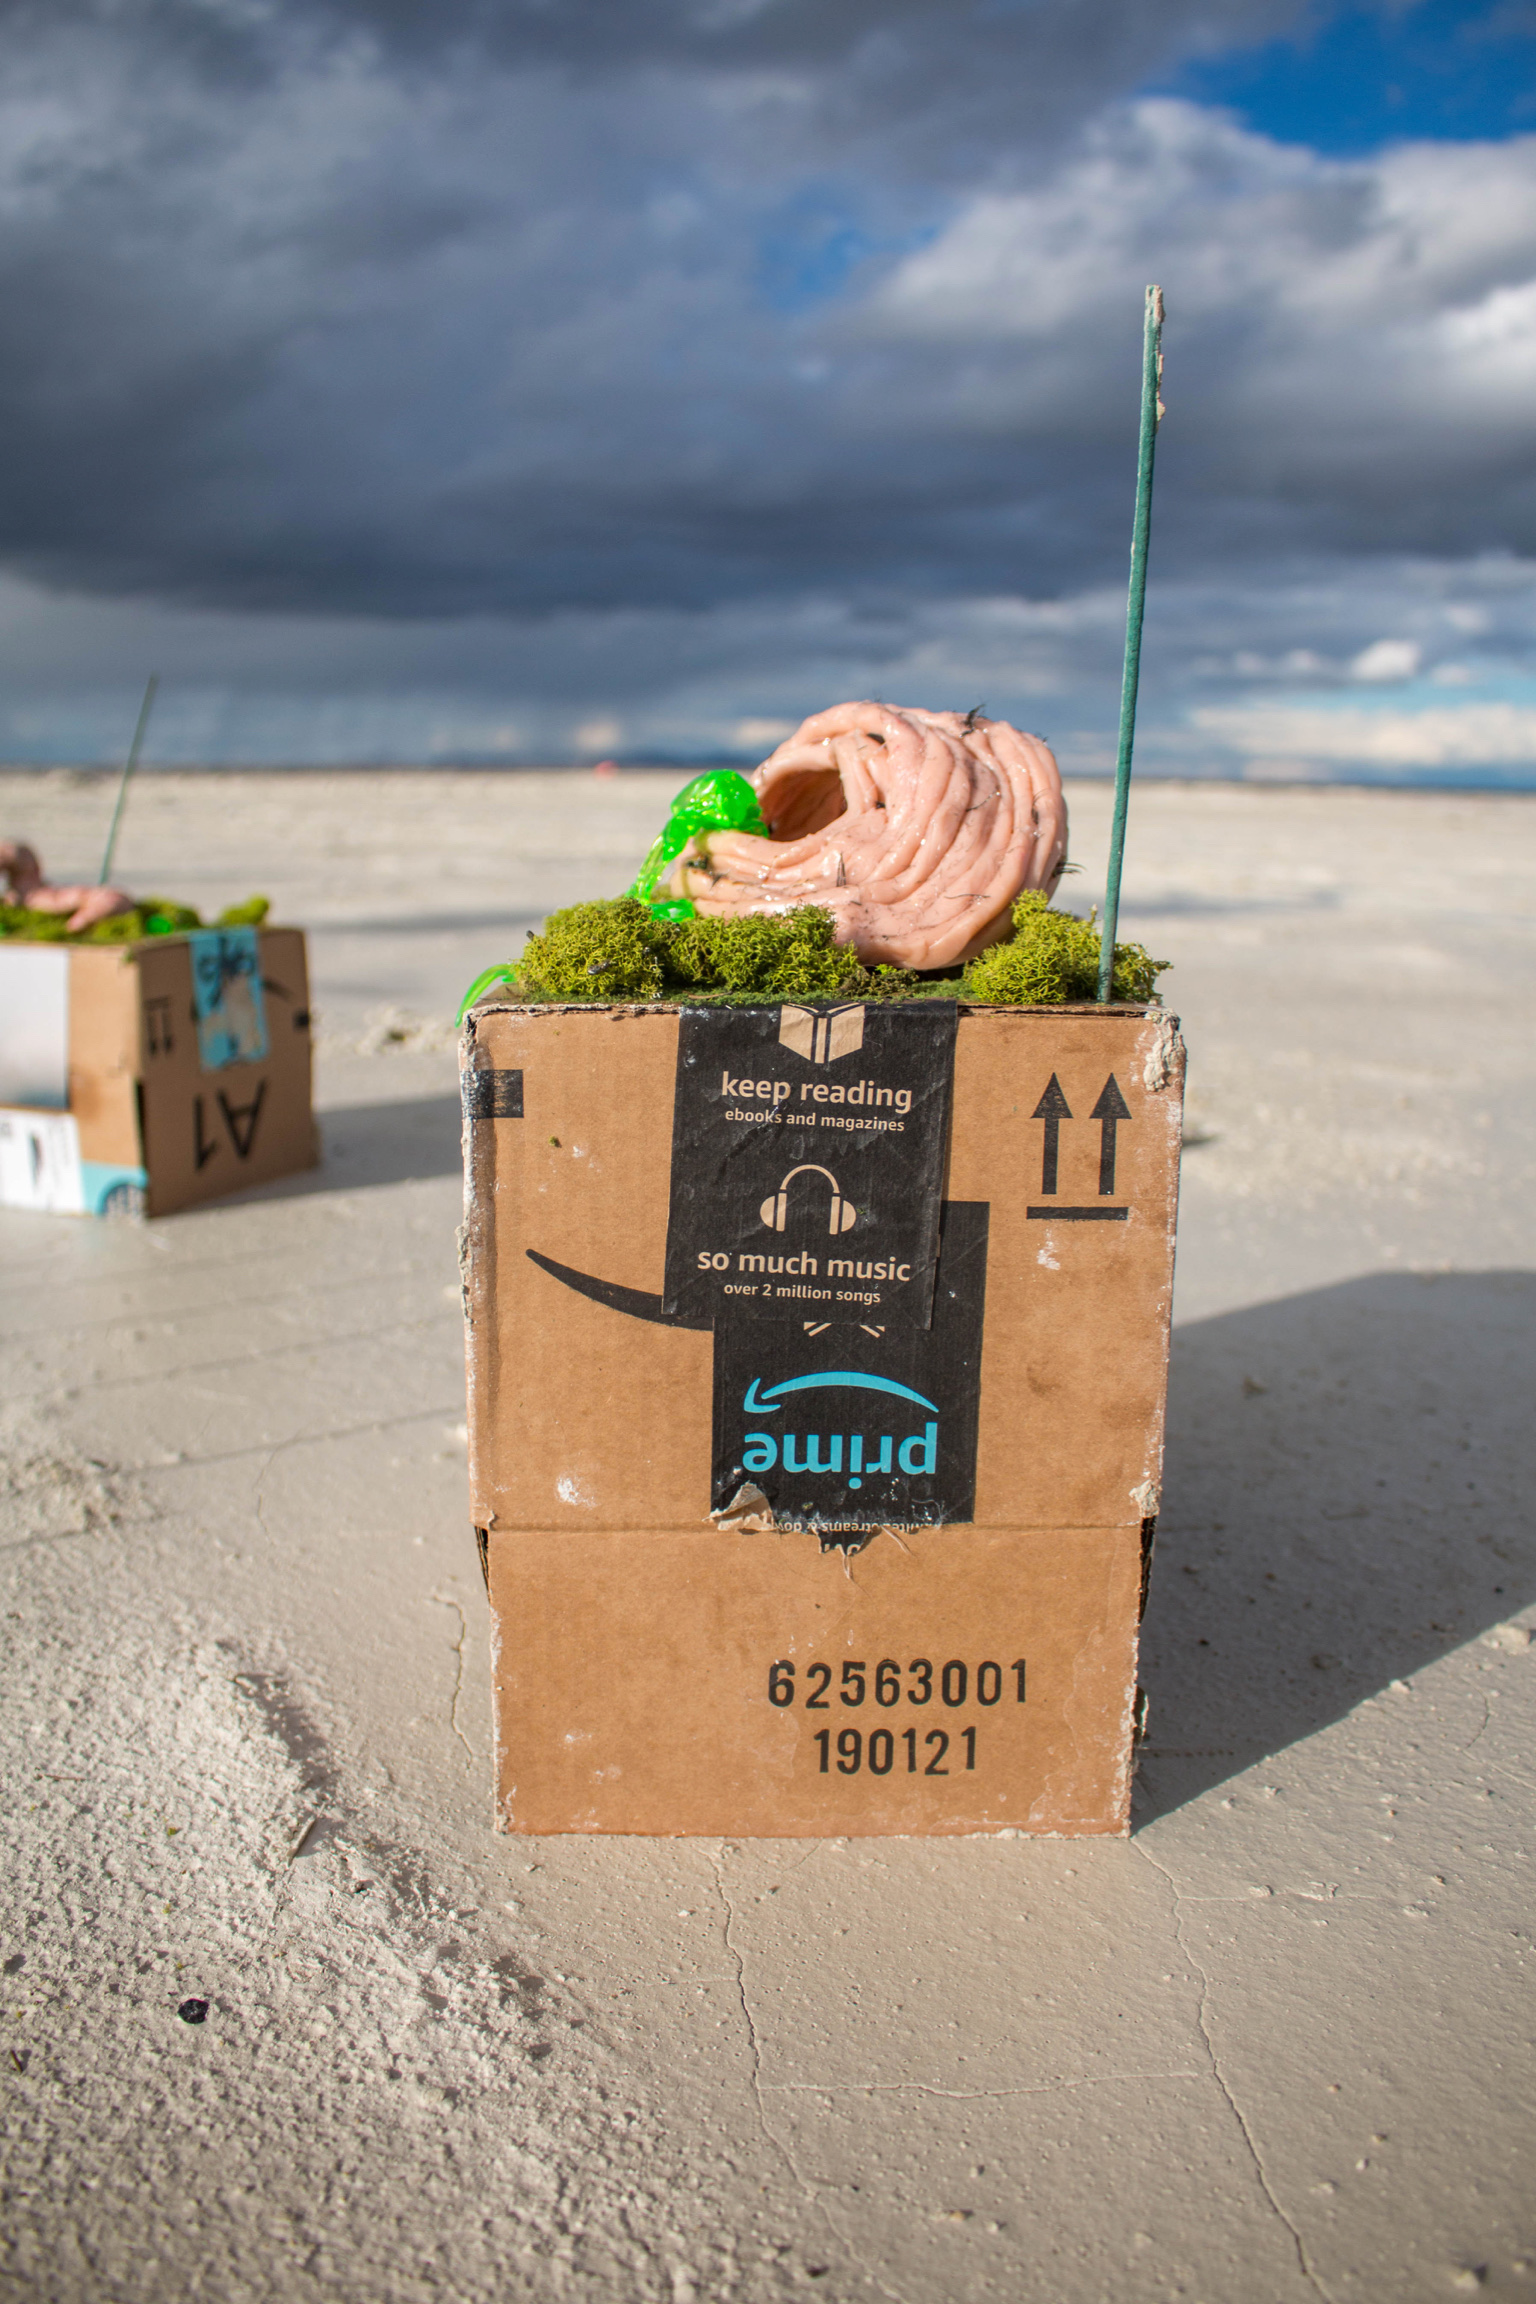 Ian Bruner,  three dollar narrative (plus eternal shipping) , 2019, Amazon box, clay, thread, melted plastic, fake mosses, fake eyelashes adhesives, photograph, light, incense